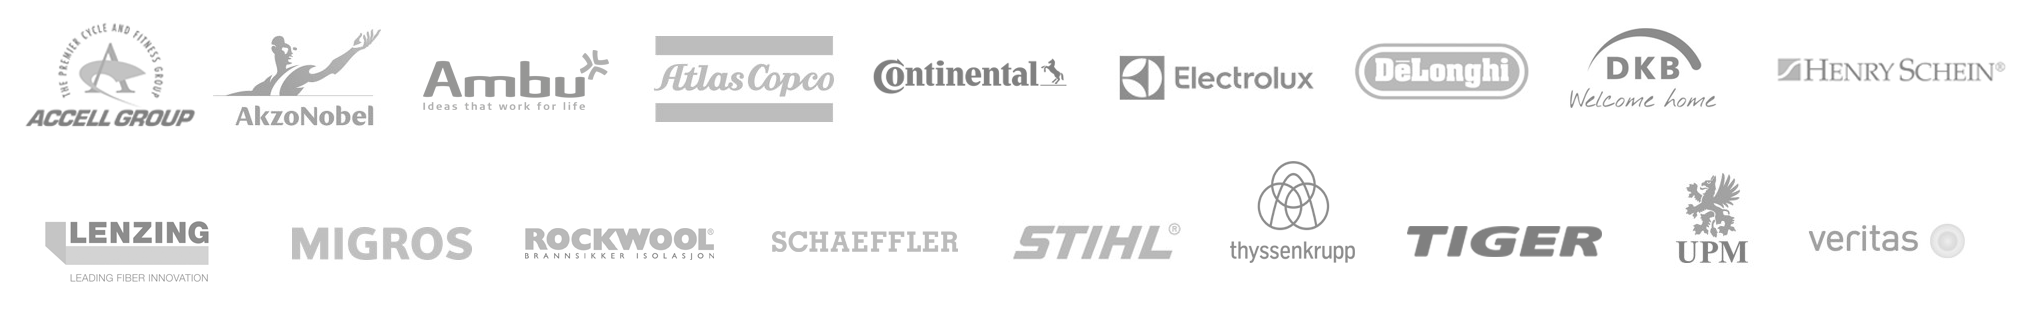 Xeneta-Customer-logos_WEBSITE.png